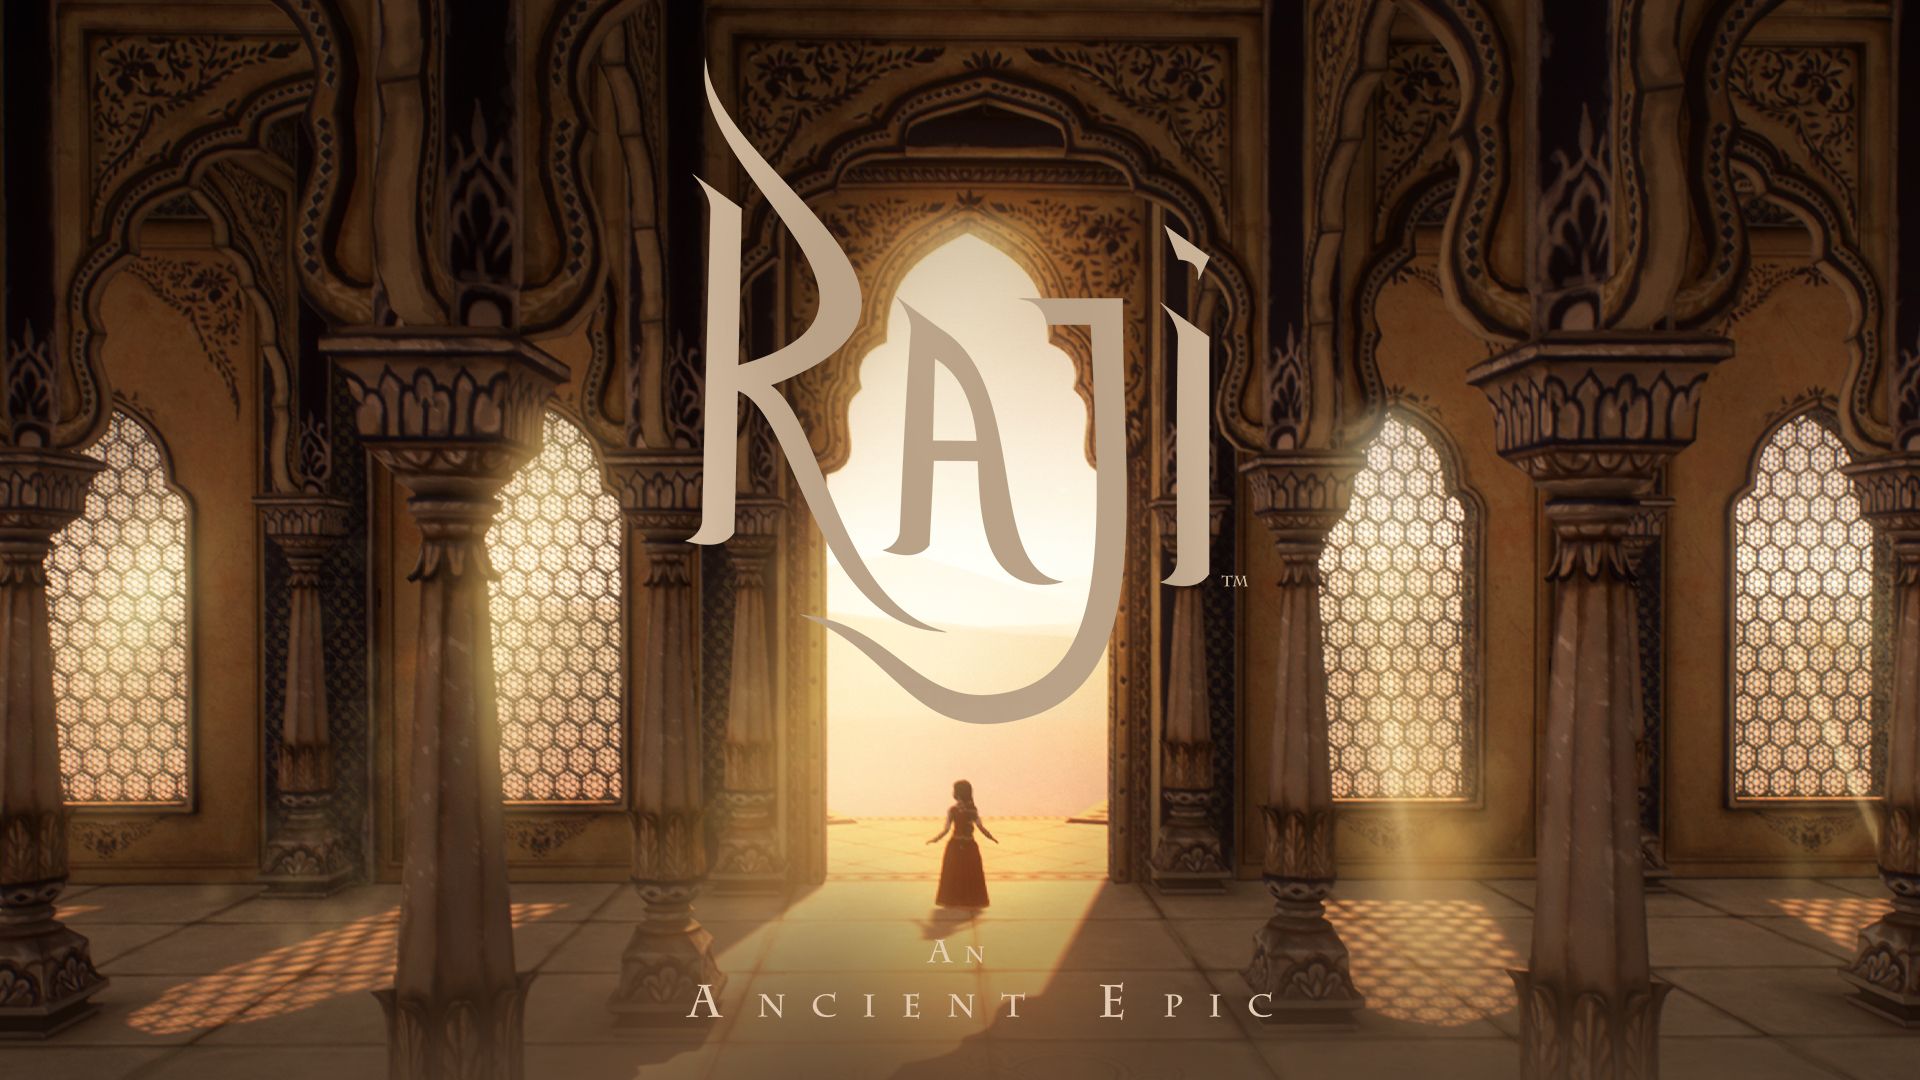 Raji: An Ancient Epic คว้าสามรางวัลใหญ่ งาน Indie Game Award 2021 ที่ไทเป